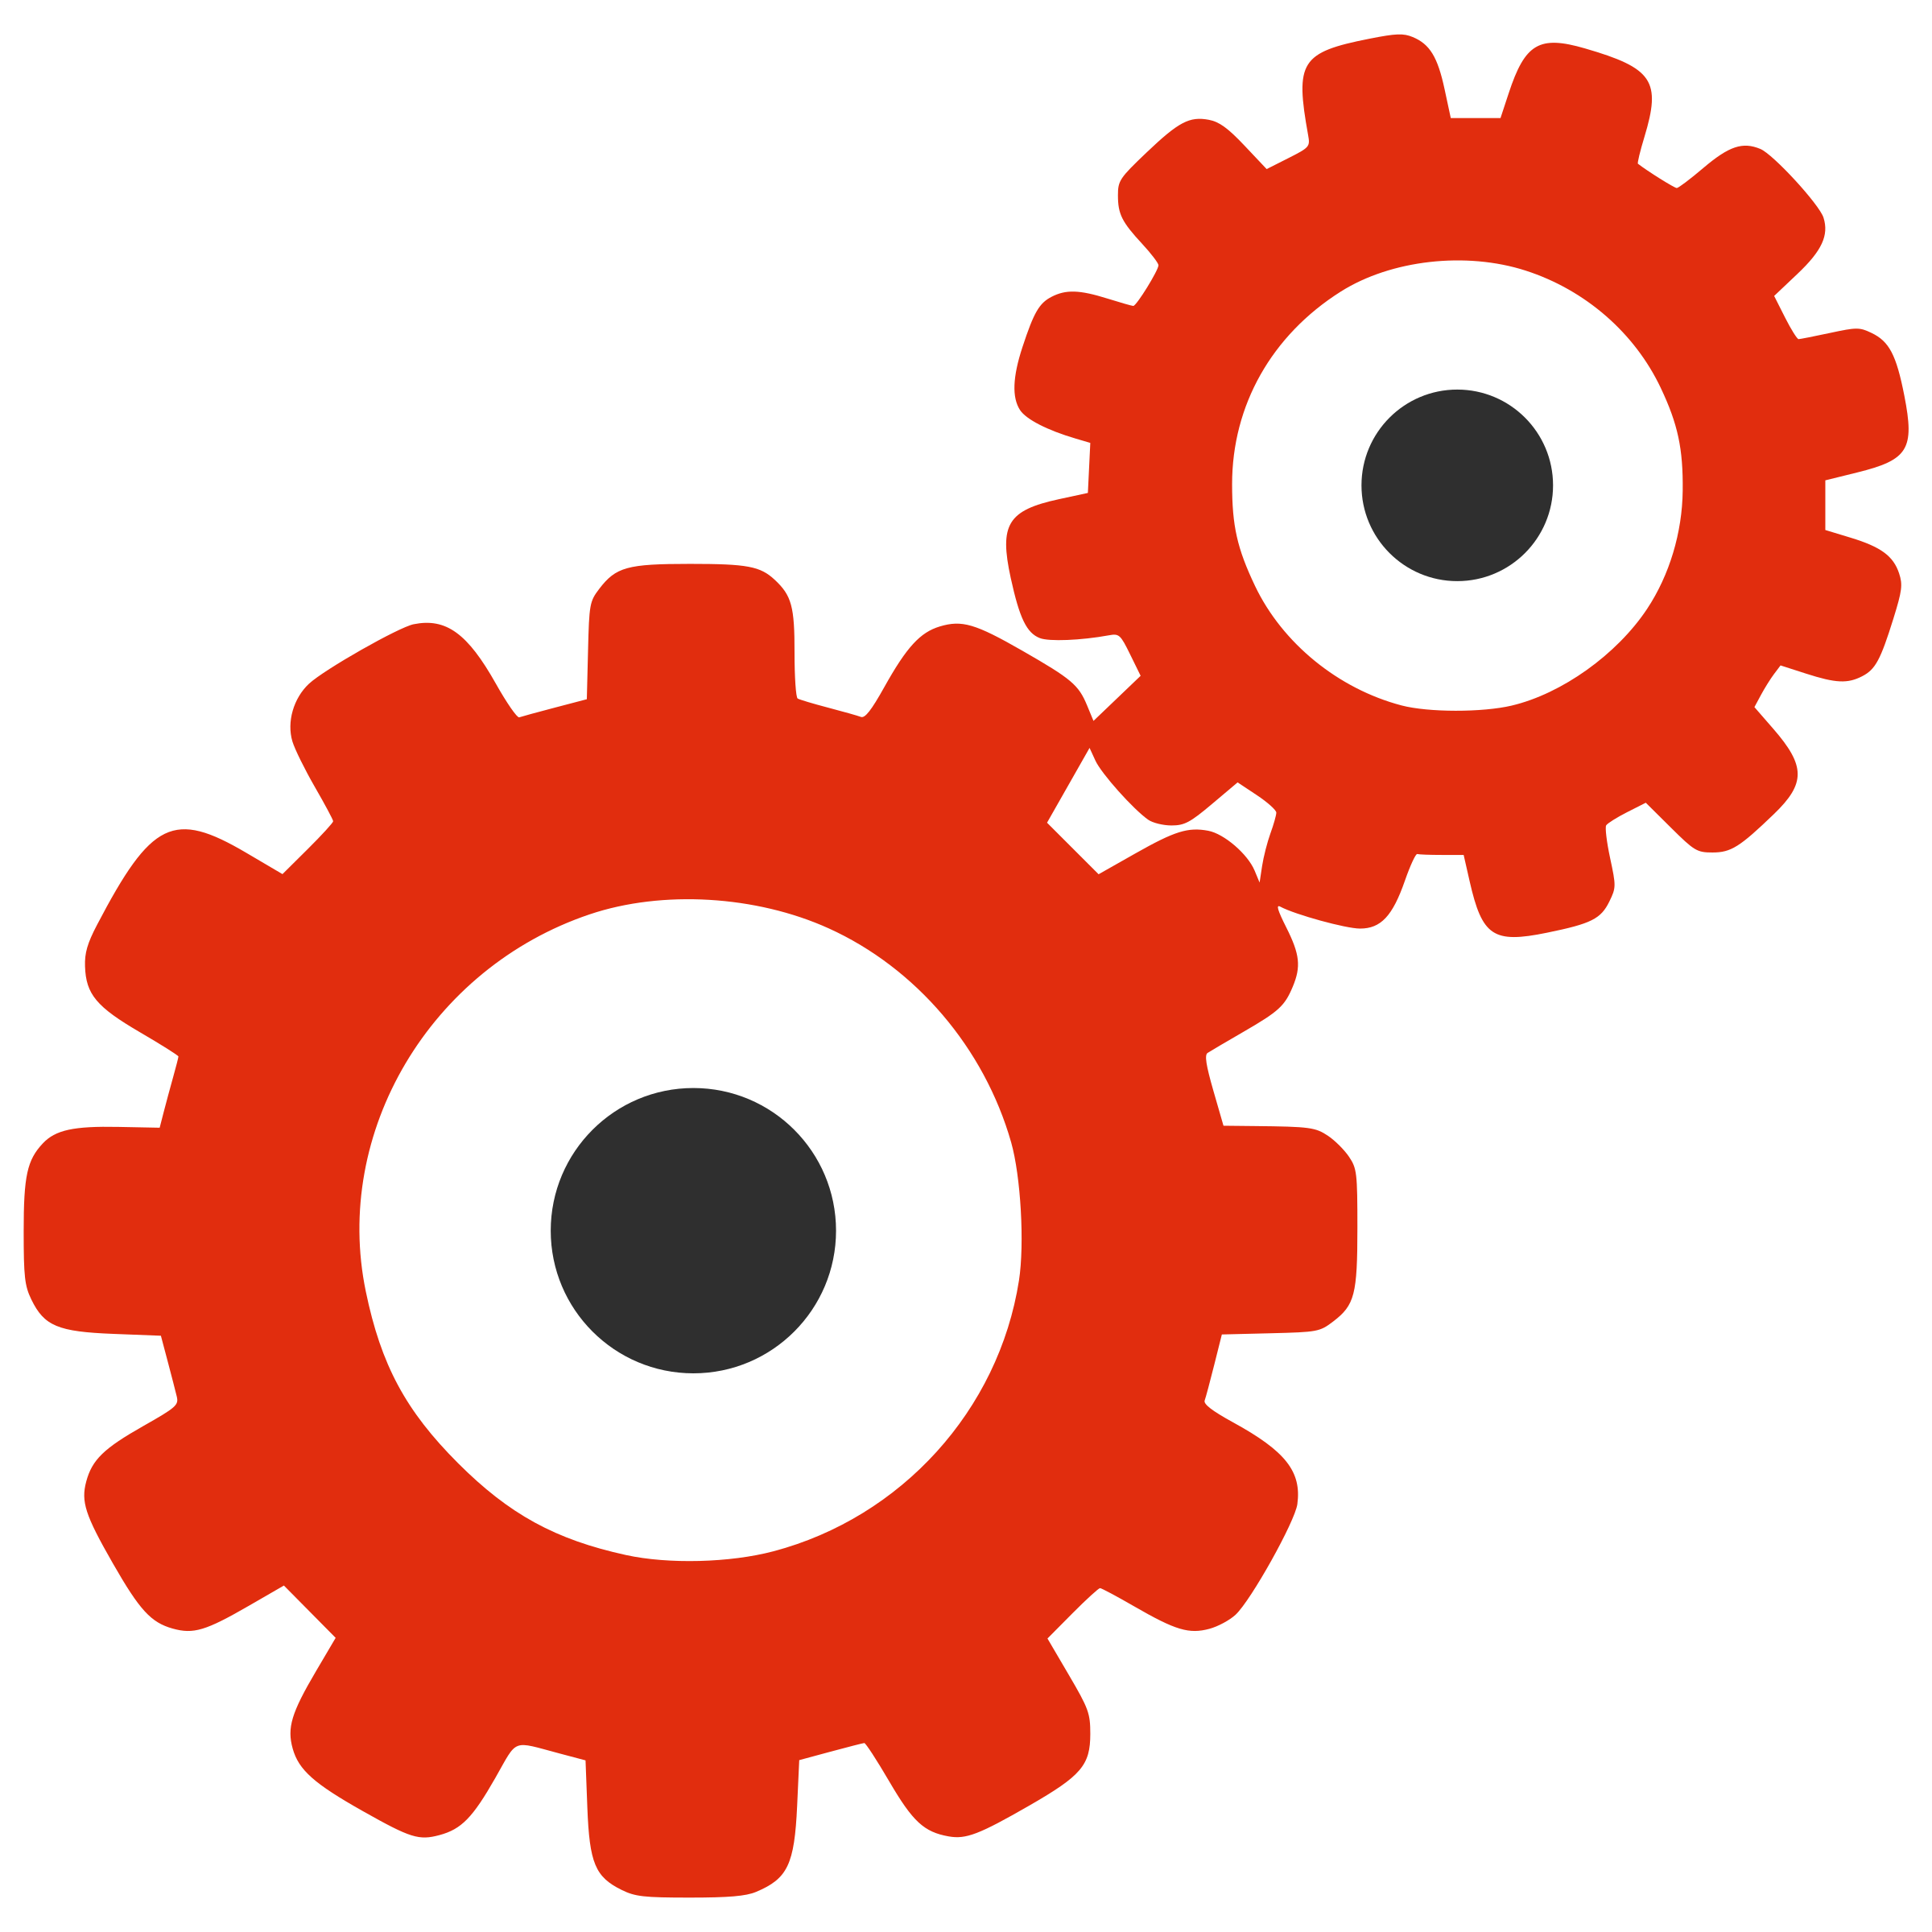 clipart gears